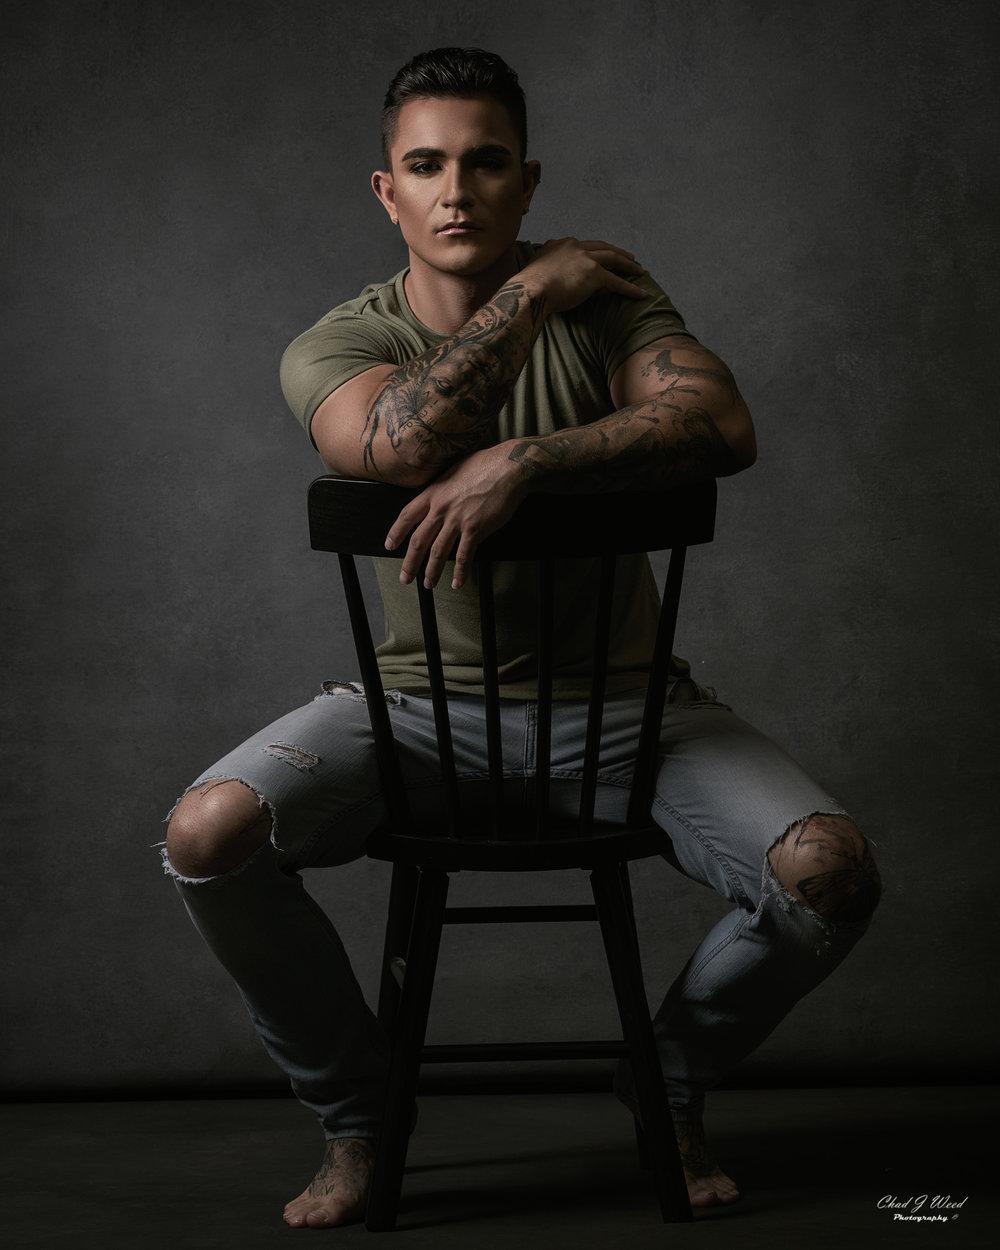 Arizona Glamour Portrait Photographer Chad Weed with Model Isaac